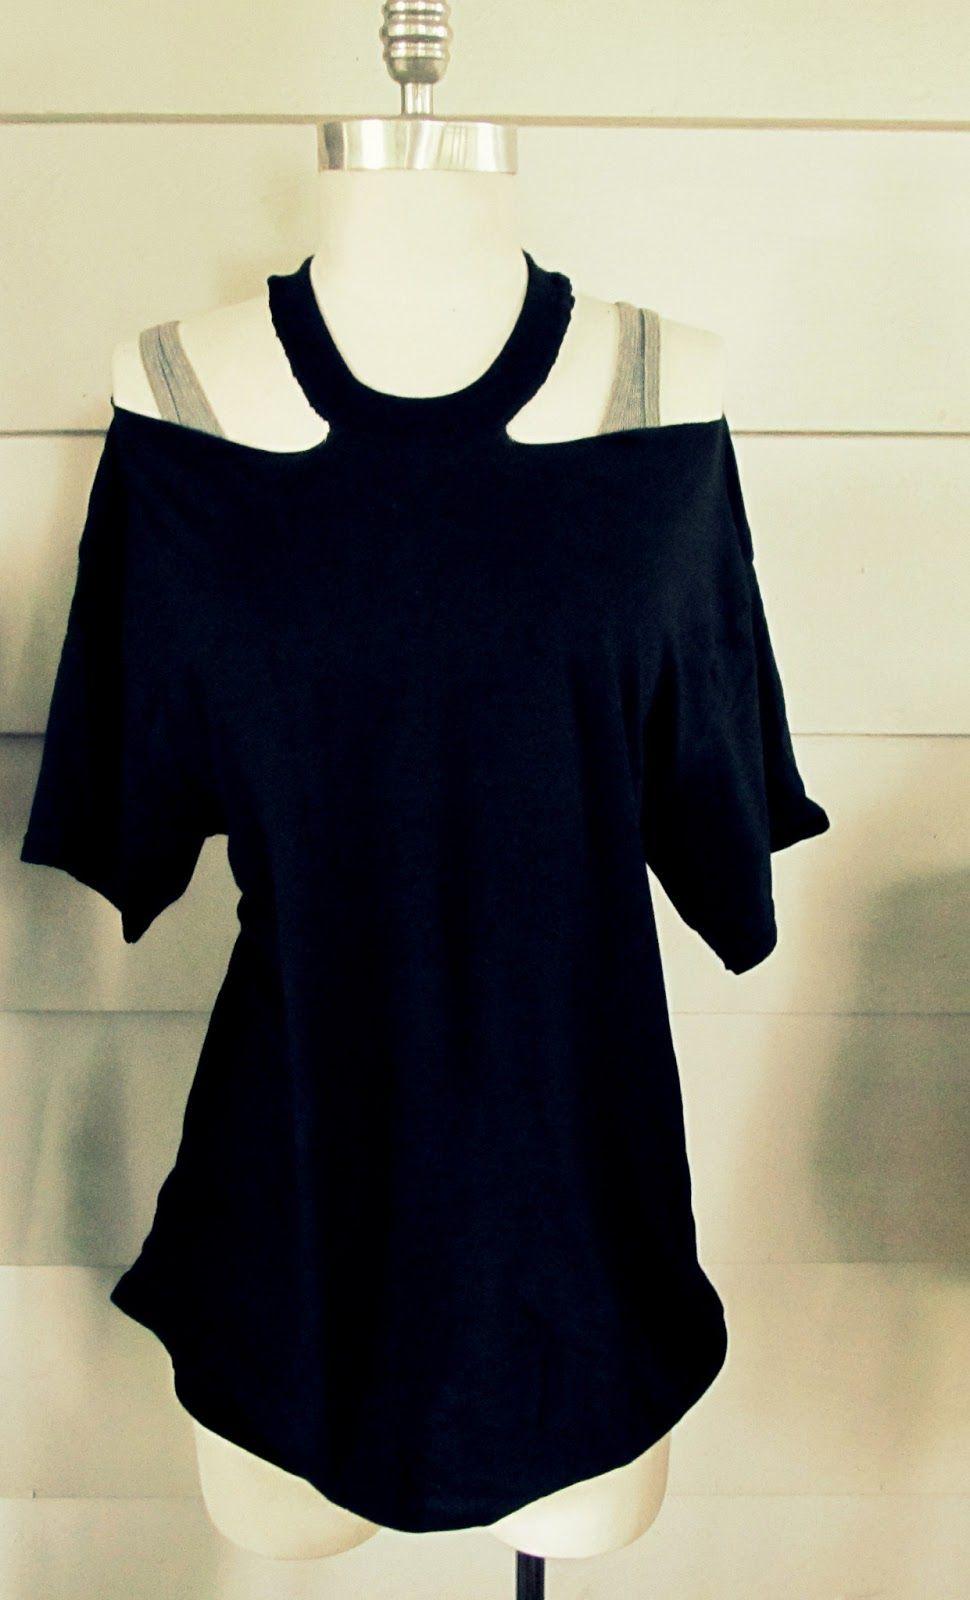 Sewing Tshirts Refashion No Sew Jewelled Halter T Shirt Diy Diy Wear It Pinterest